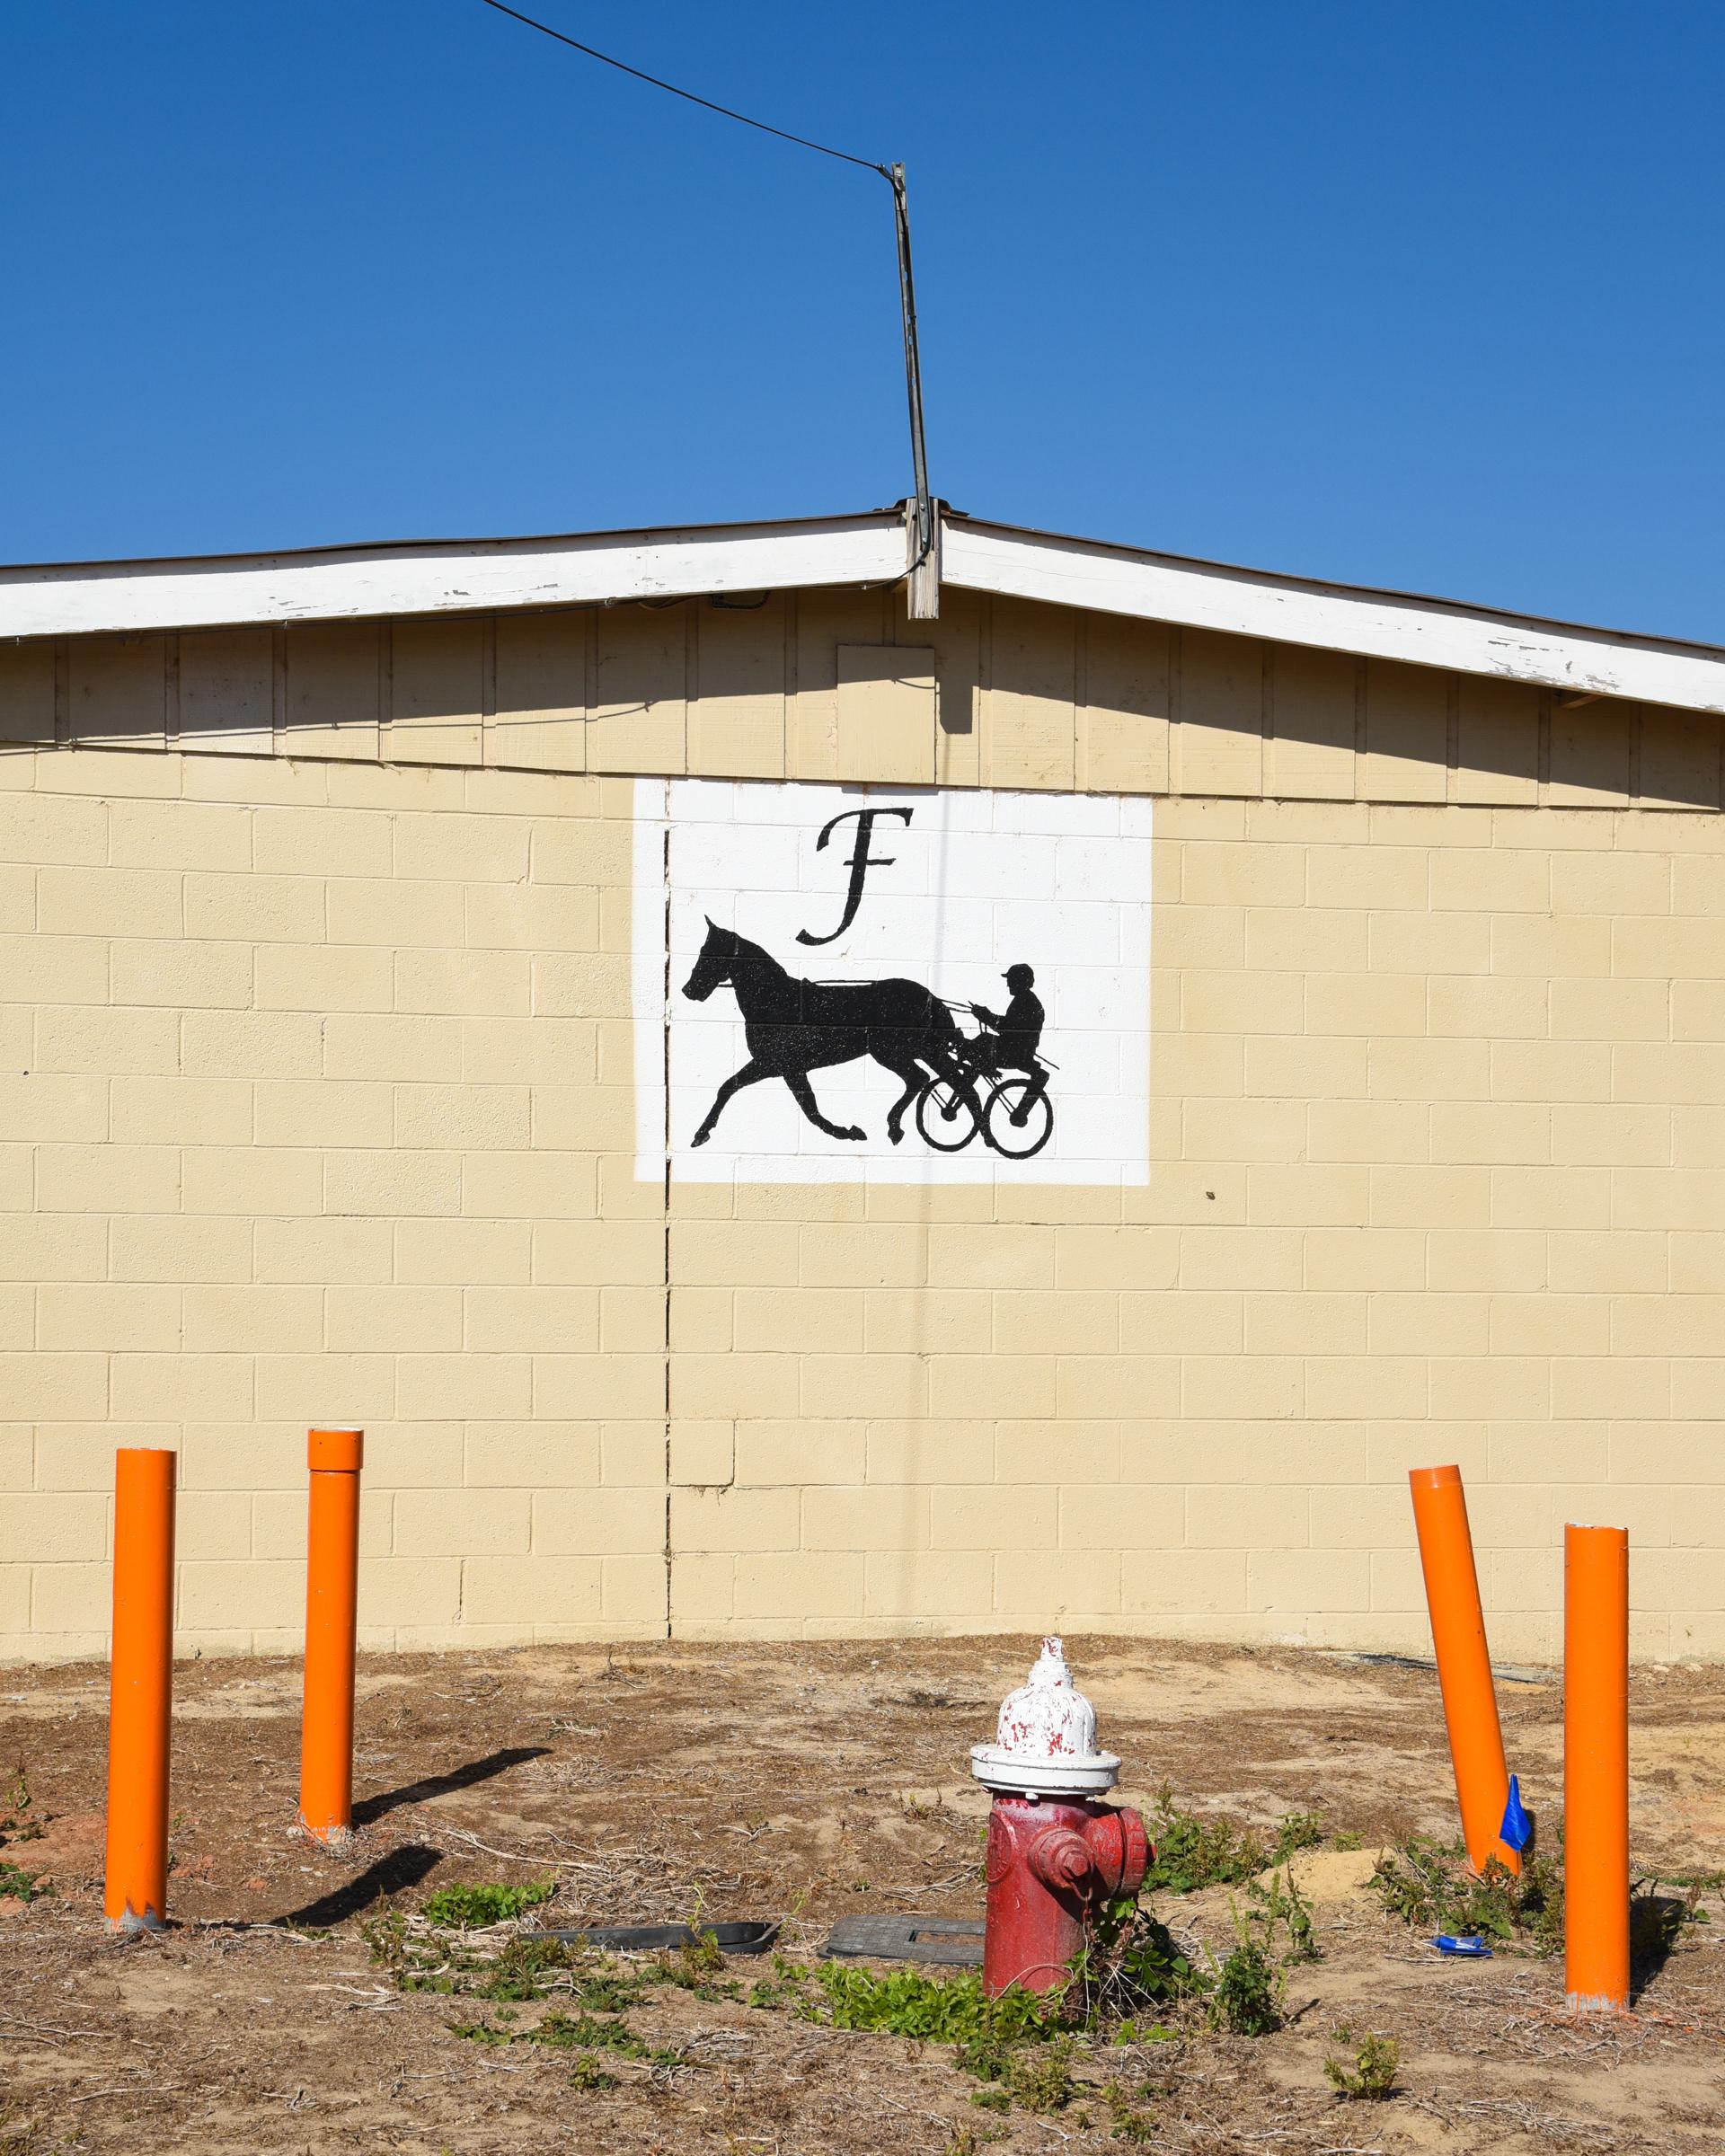 Hawkinsville, GA. 2016. Digital Image.